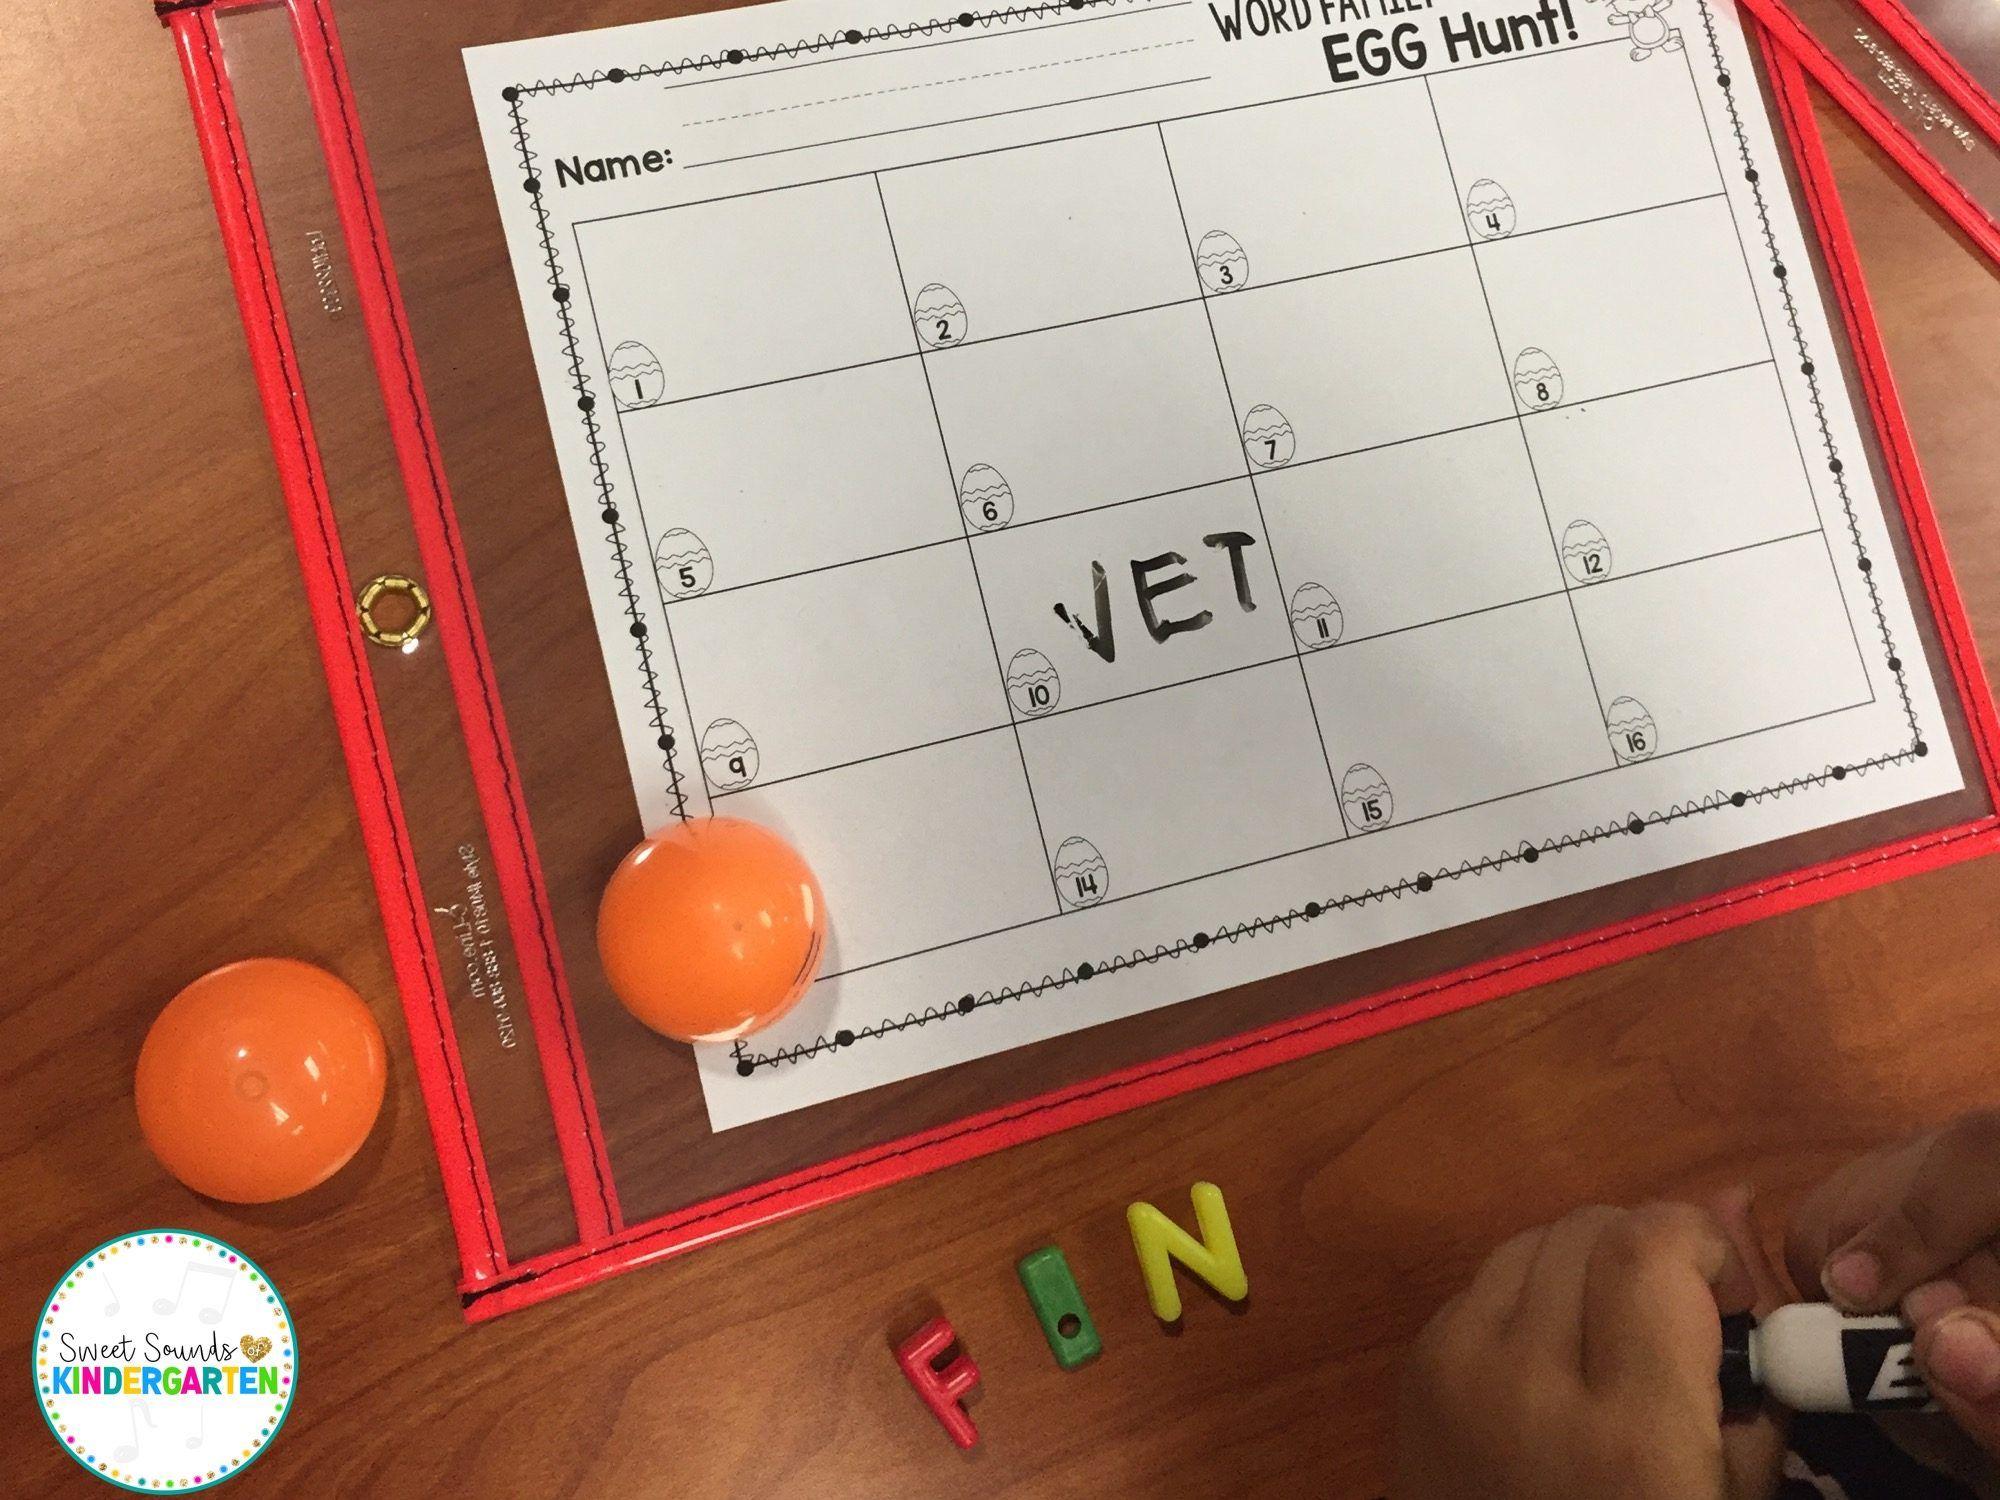 Word Family Egg Hunt Freebie